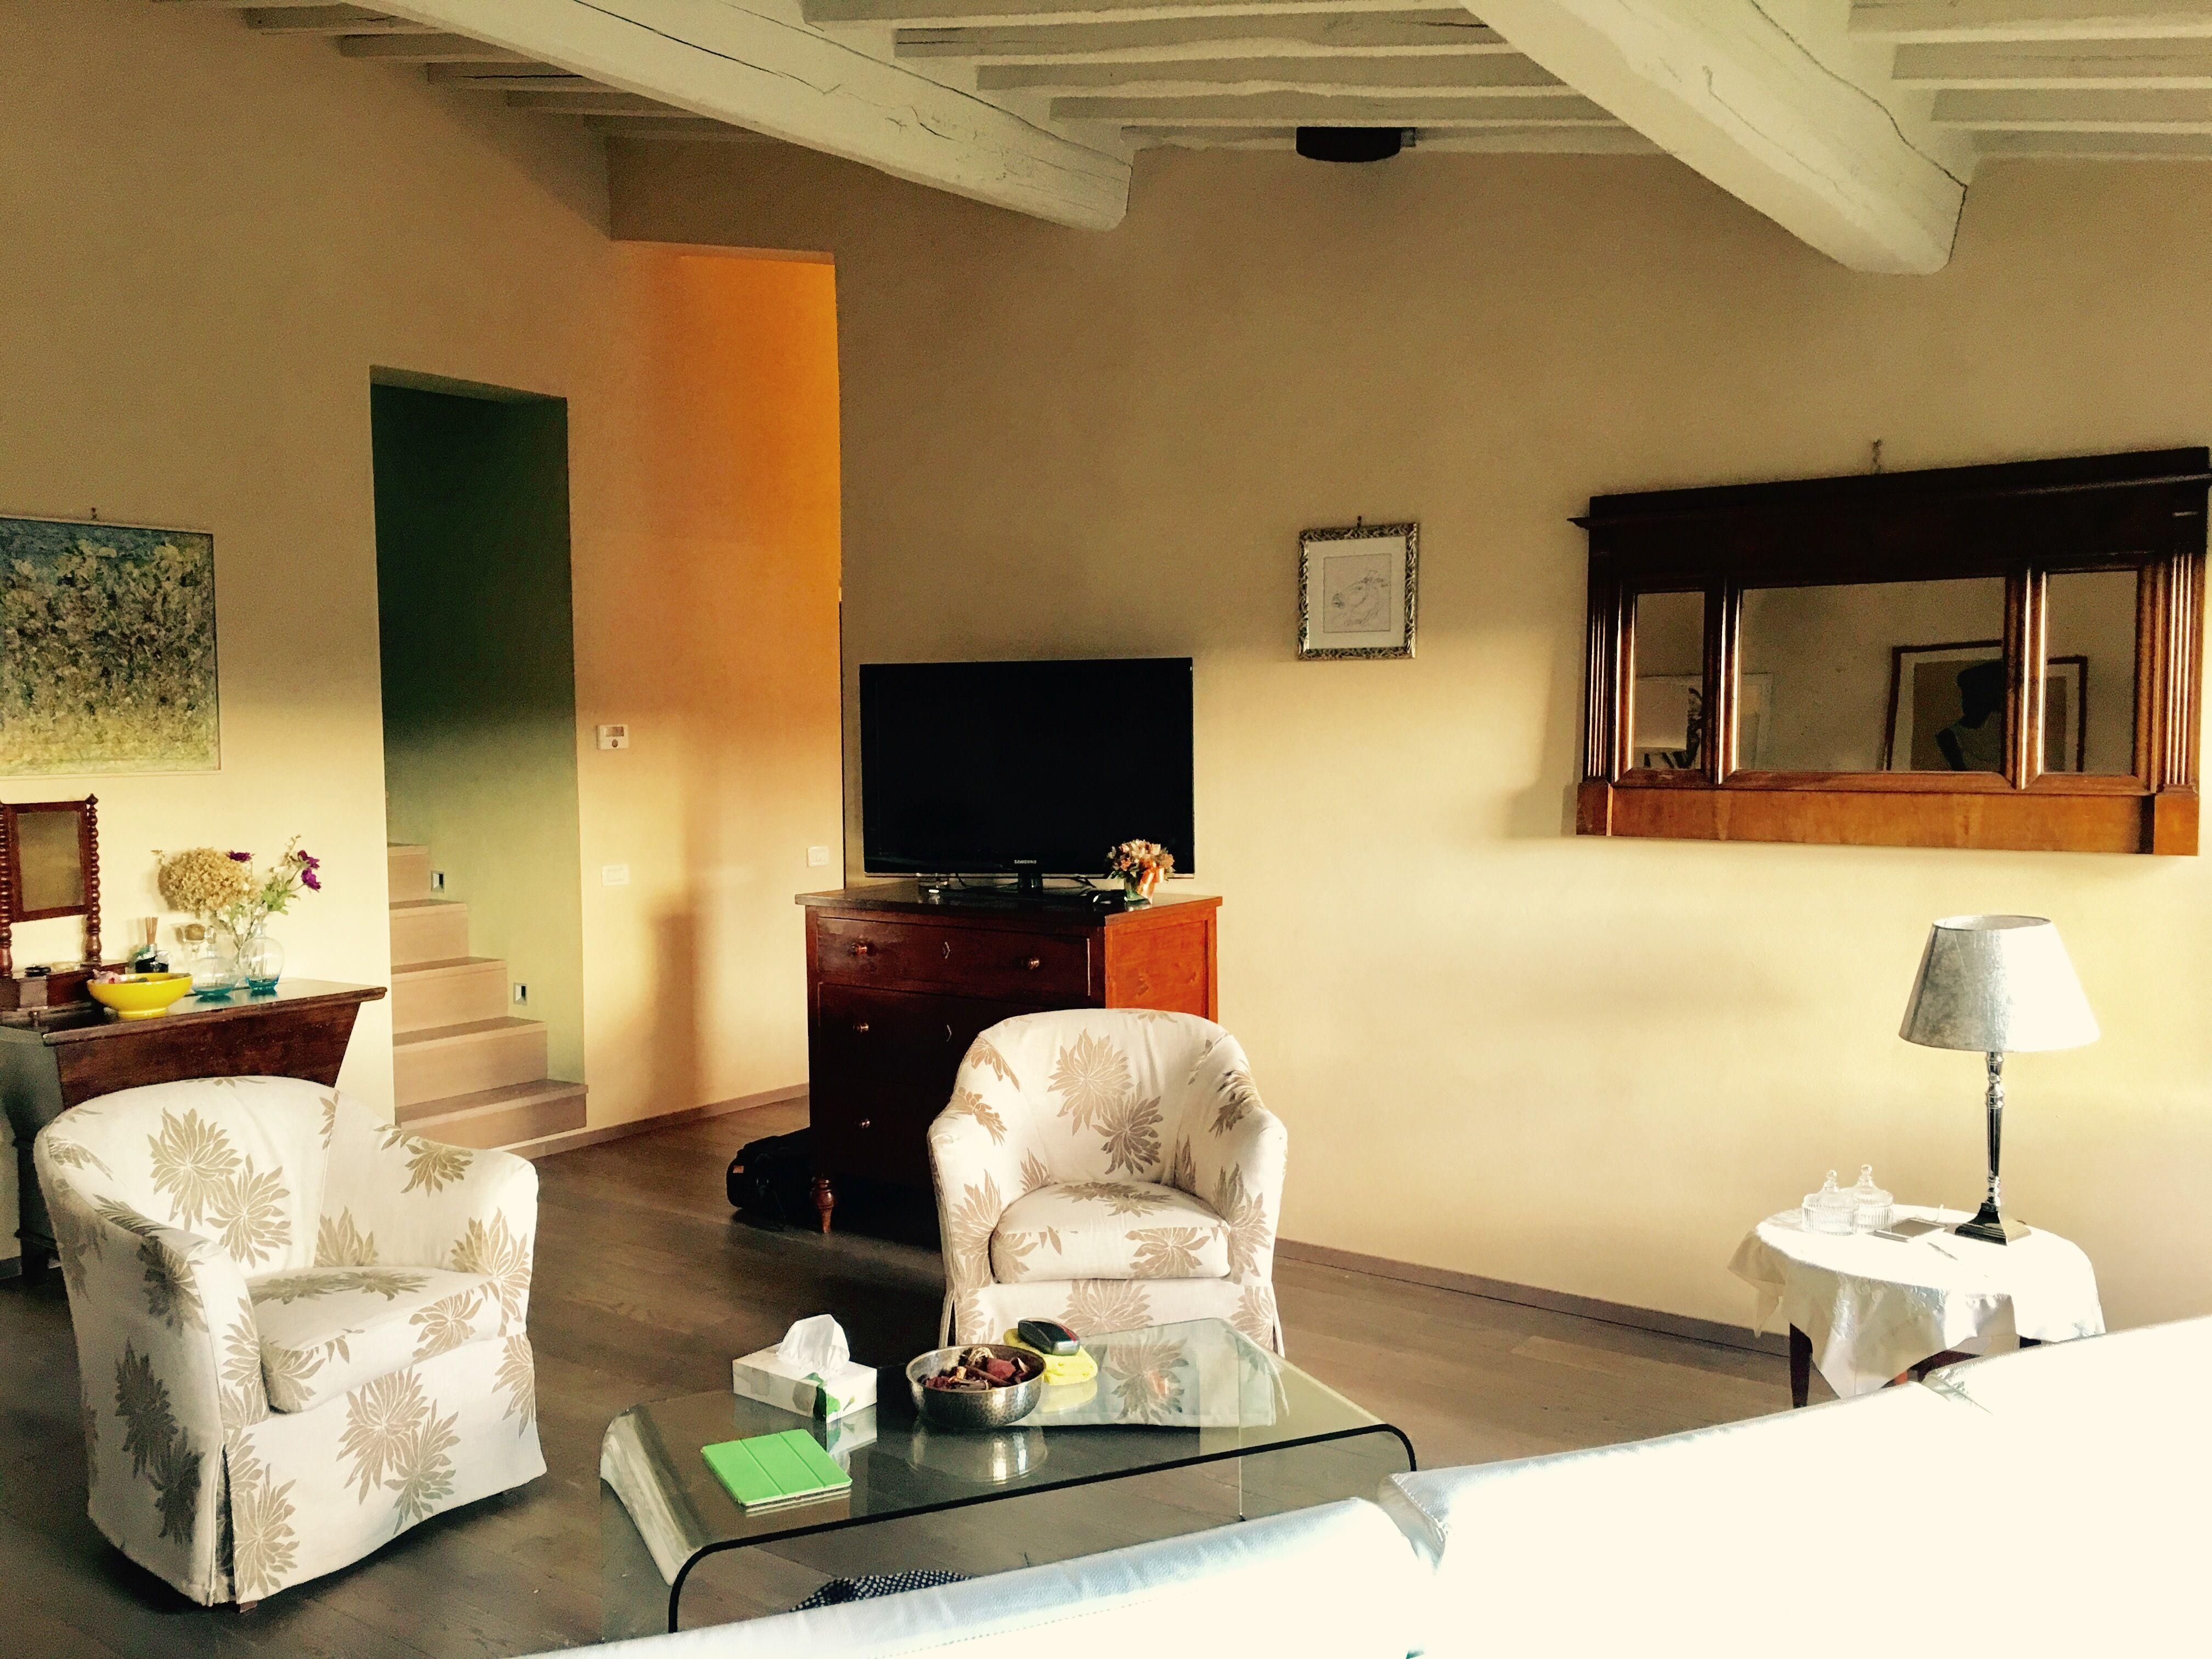 Ulignano Villa Vacation Rental Casa Bondi that sleeps 2 people in 1 ...